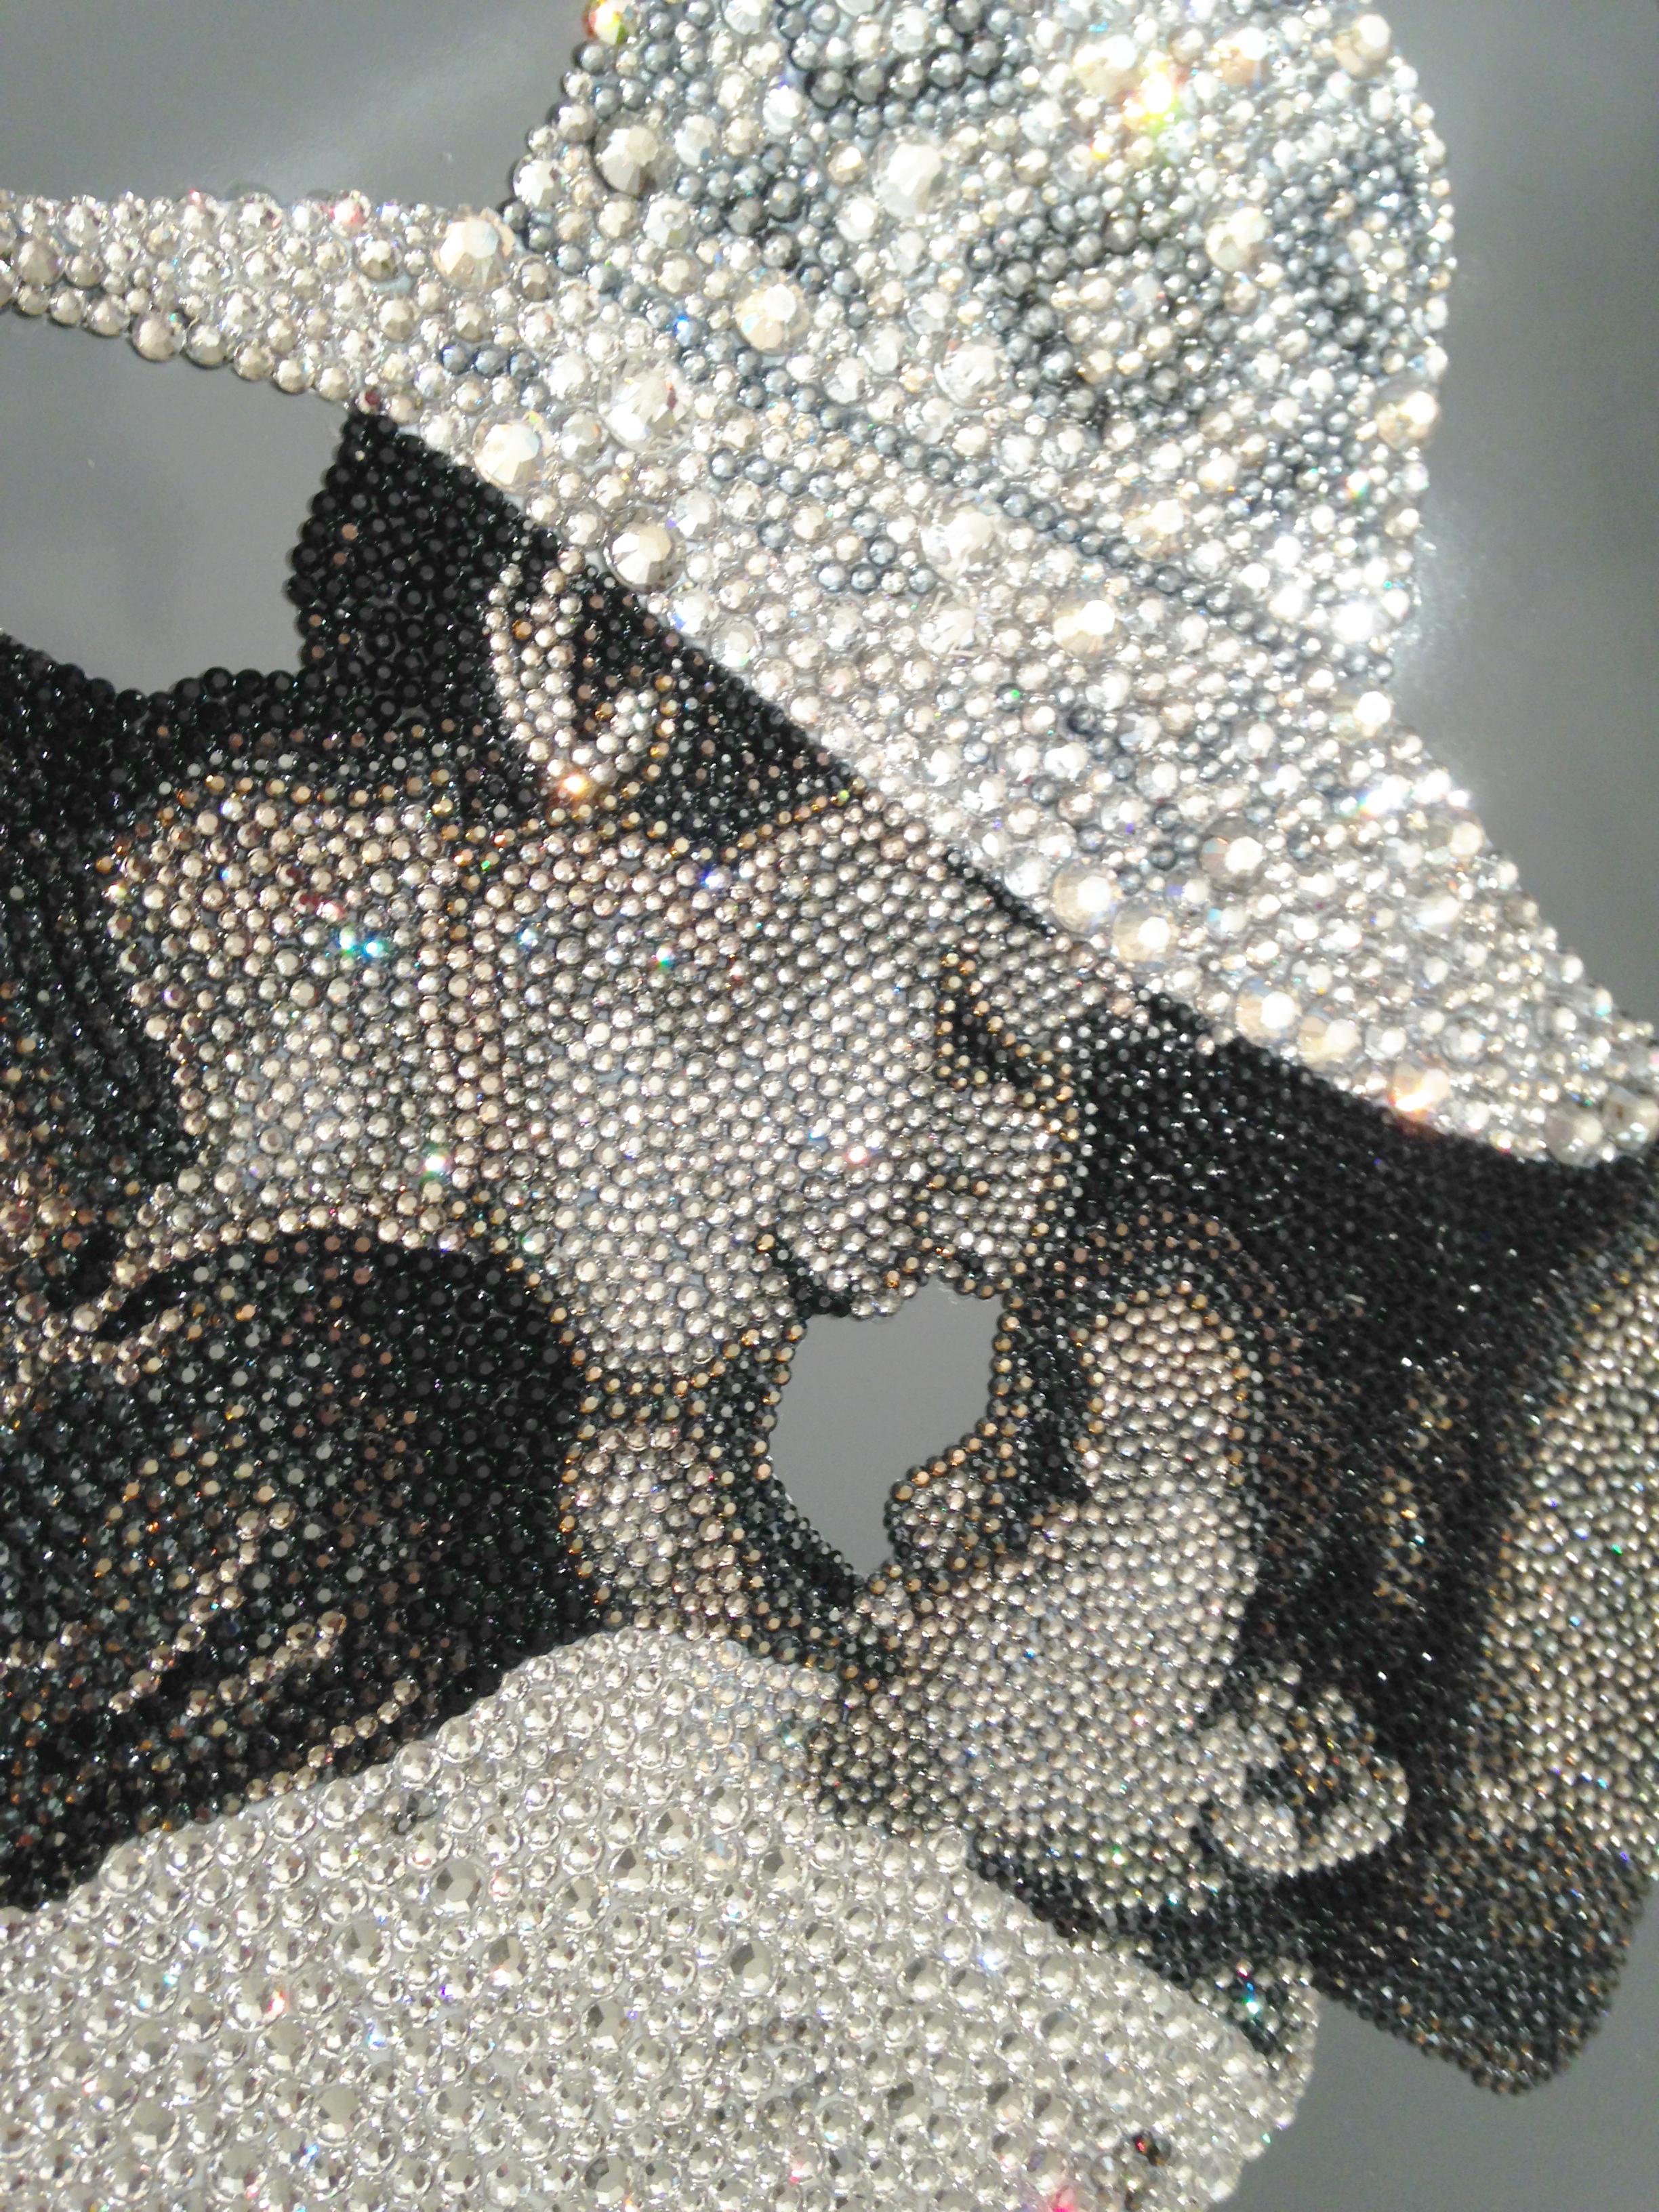 HRH Princess Haya Natalie Daghestani Swarovski Crystal Art4